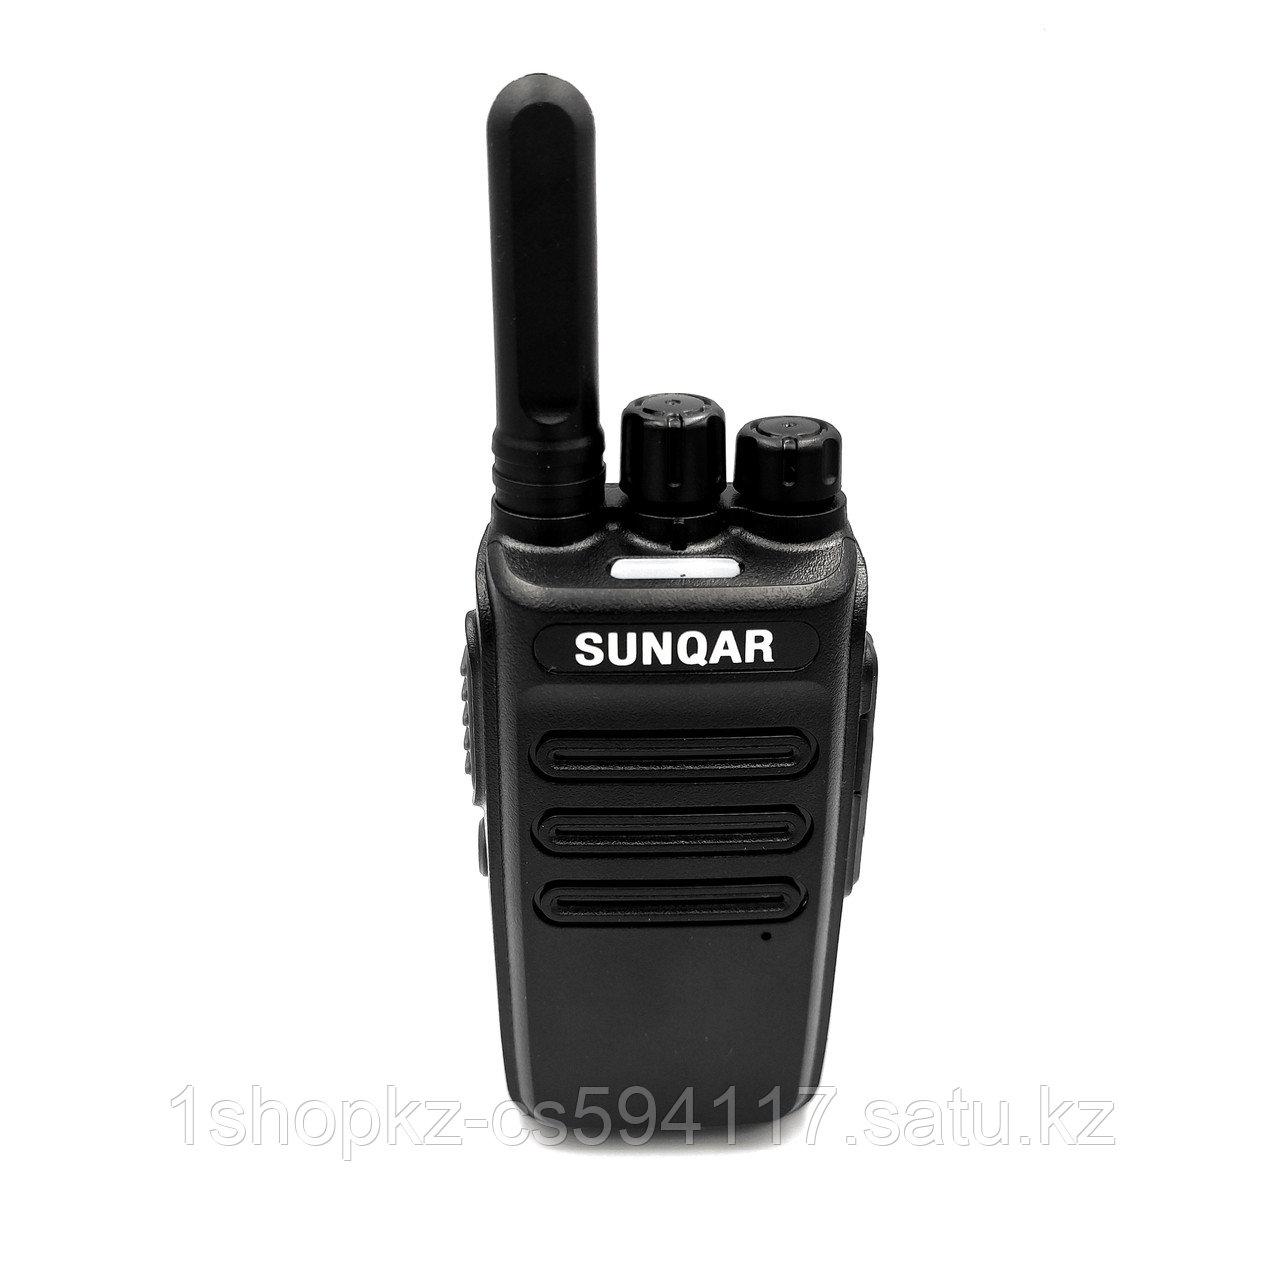 Рация Sunqar X-950